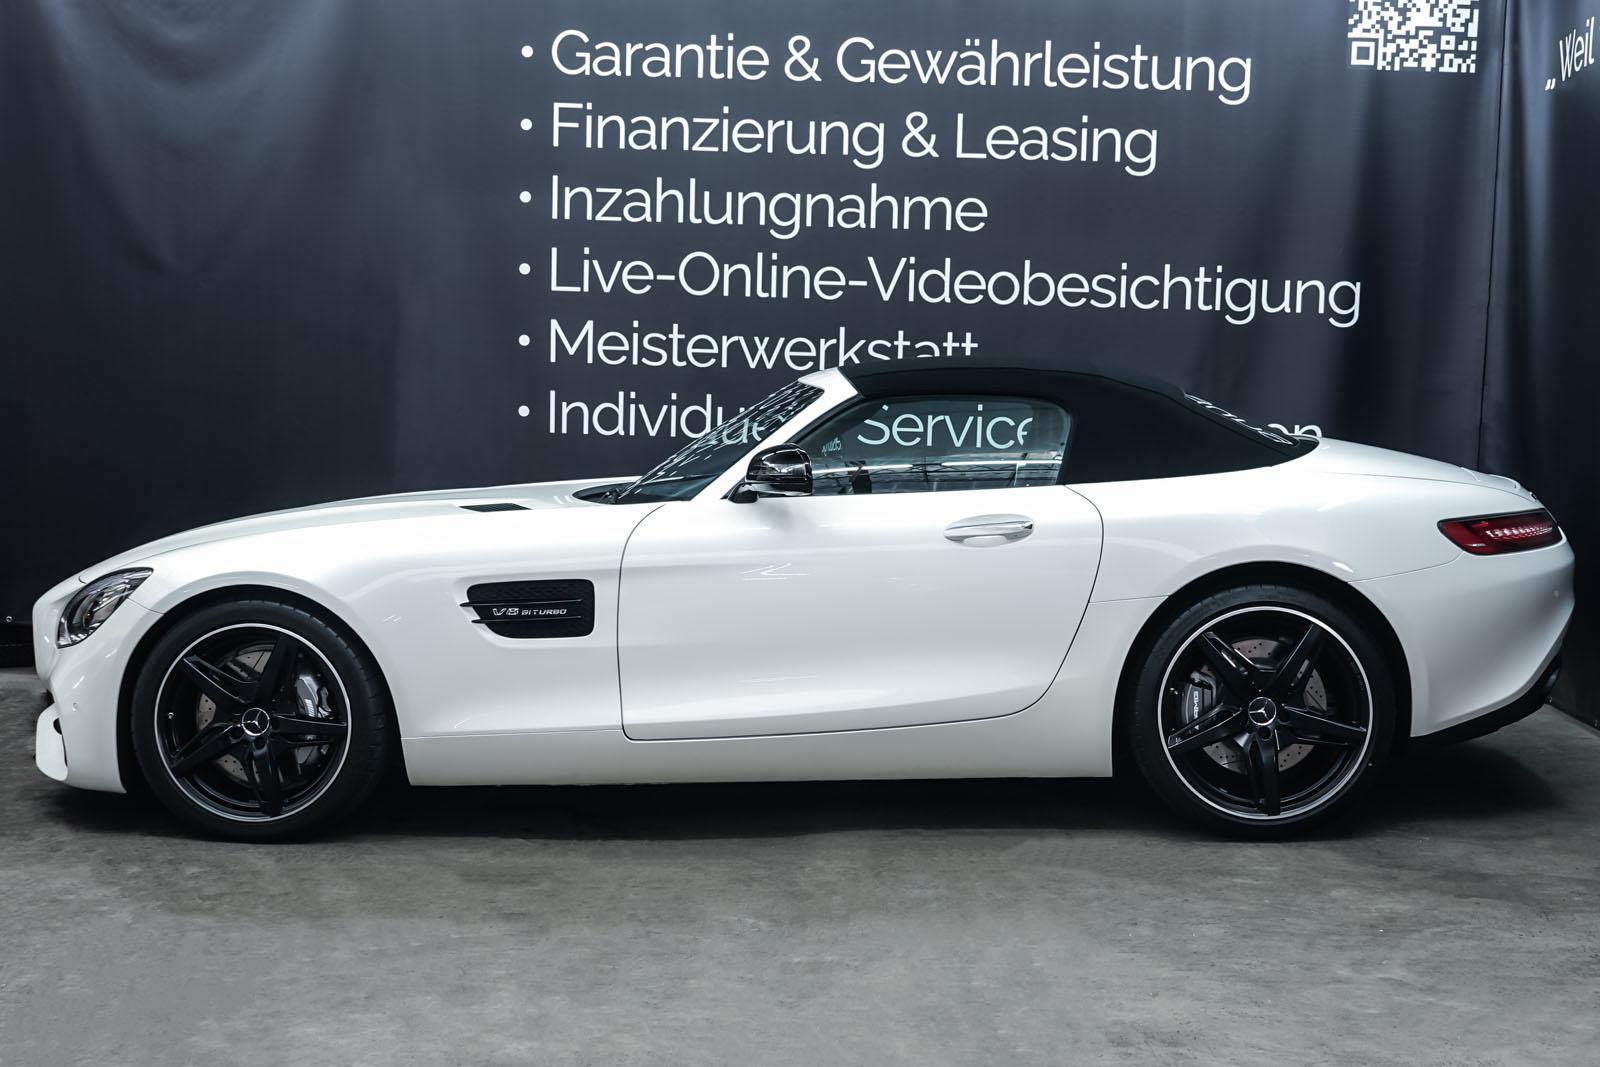 11Mercedes_Benz_AMG_GT_Roadster_Weiss_Schwarz_MB-9710_5_w